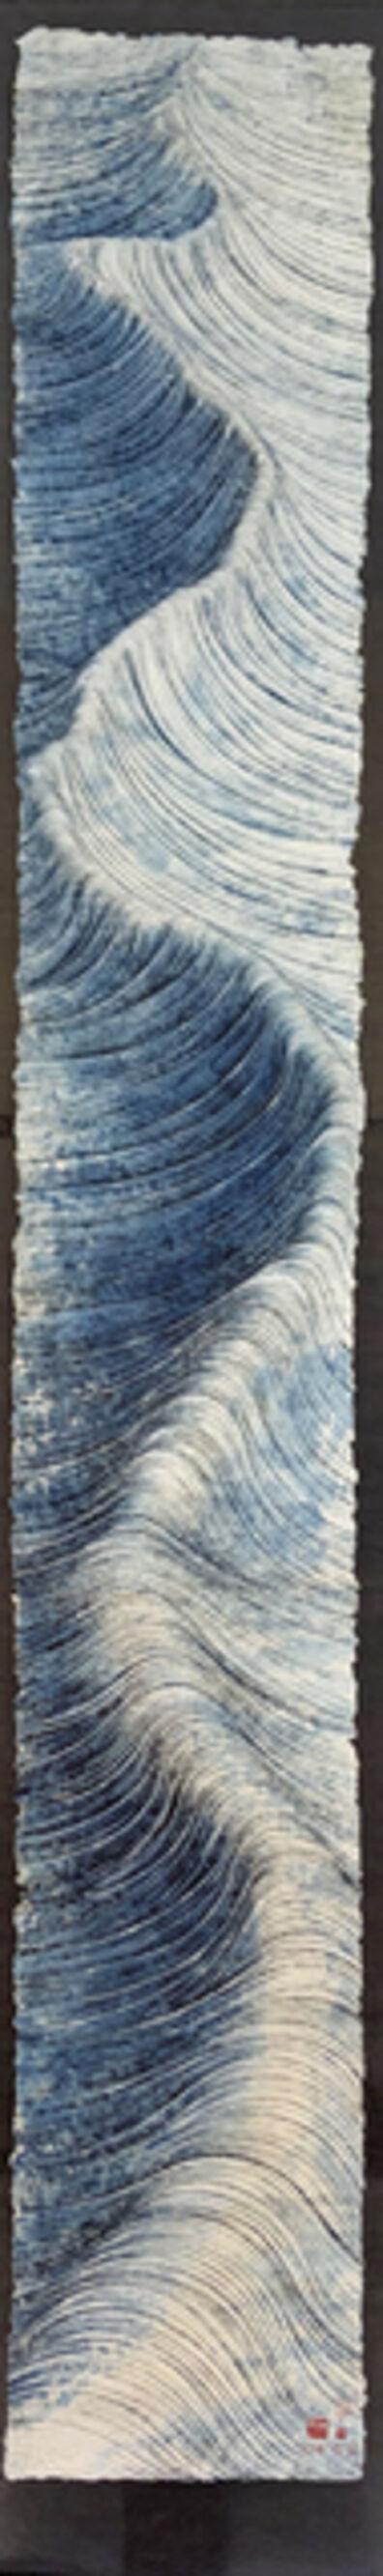 Hyun Joung Lee, 'Midnight blue Path', 2018